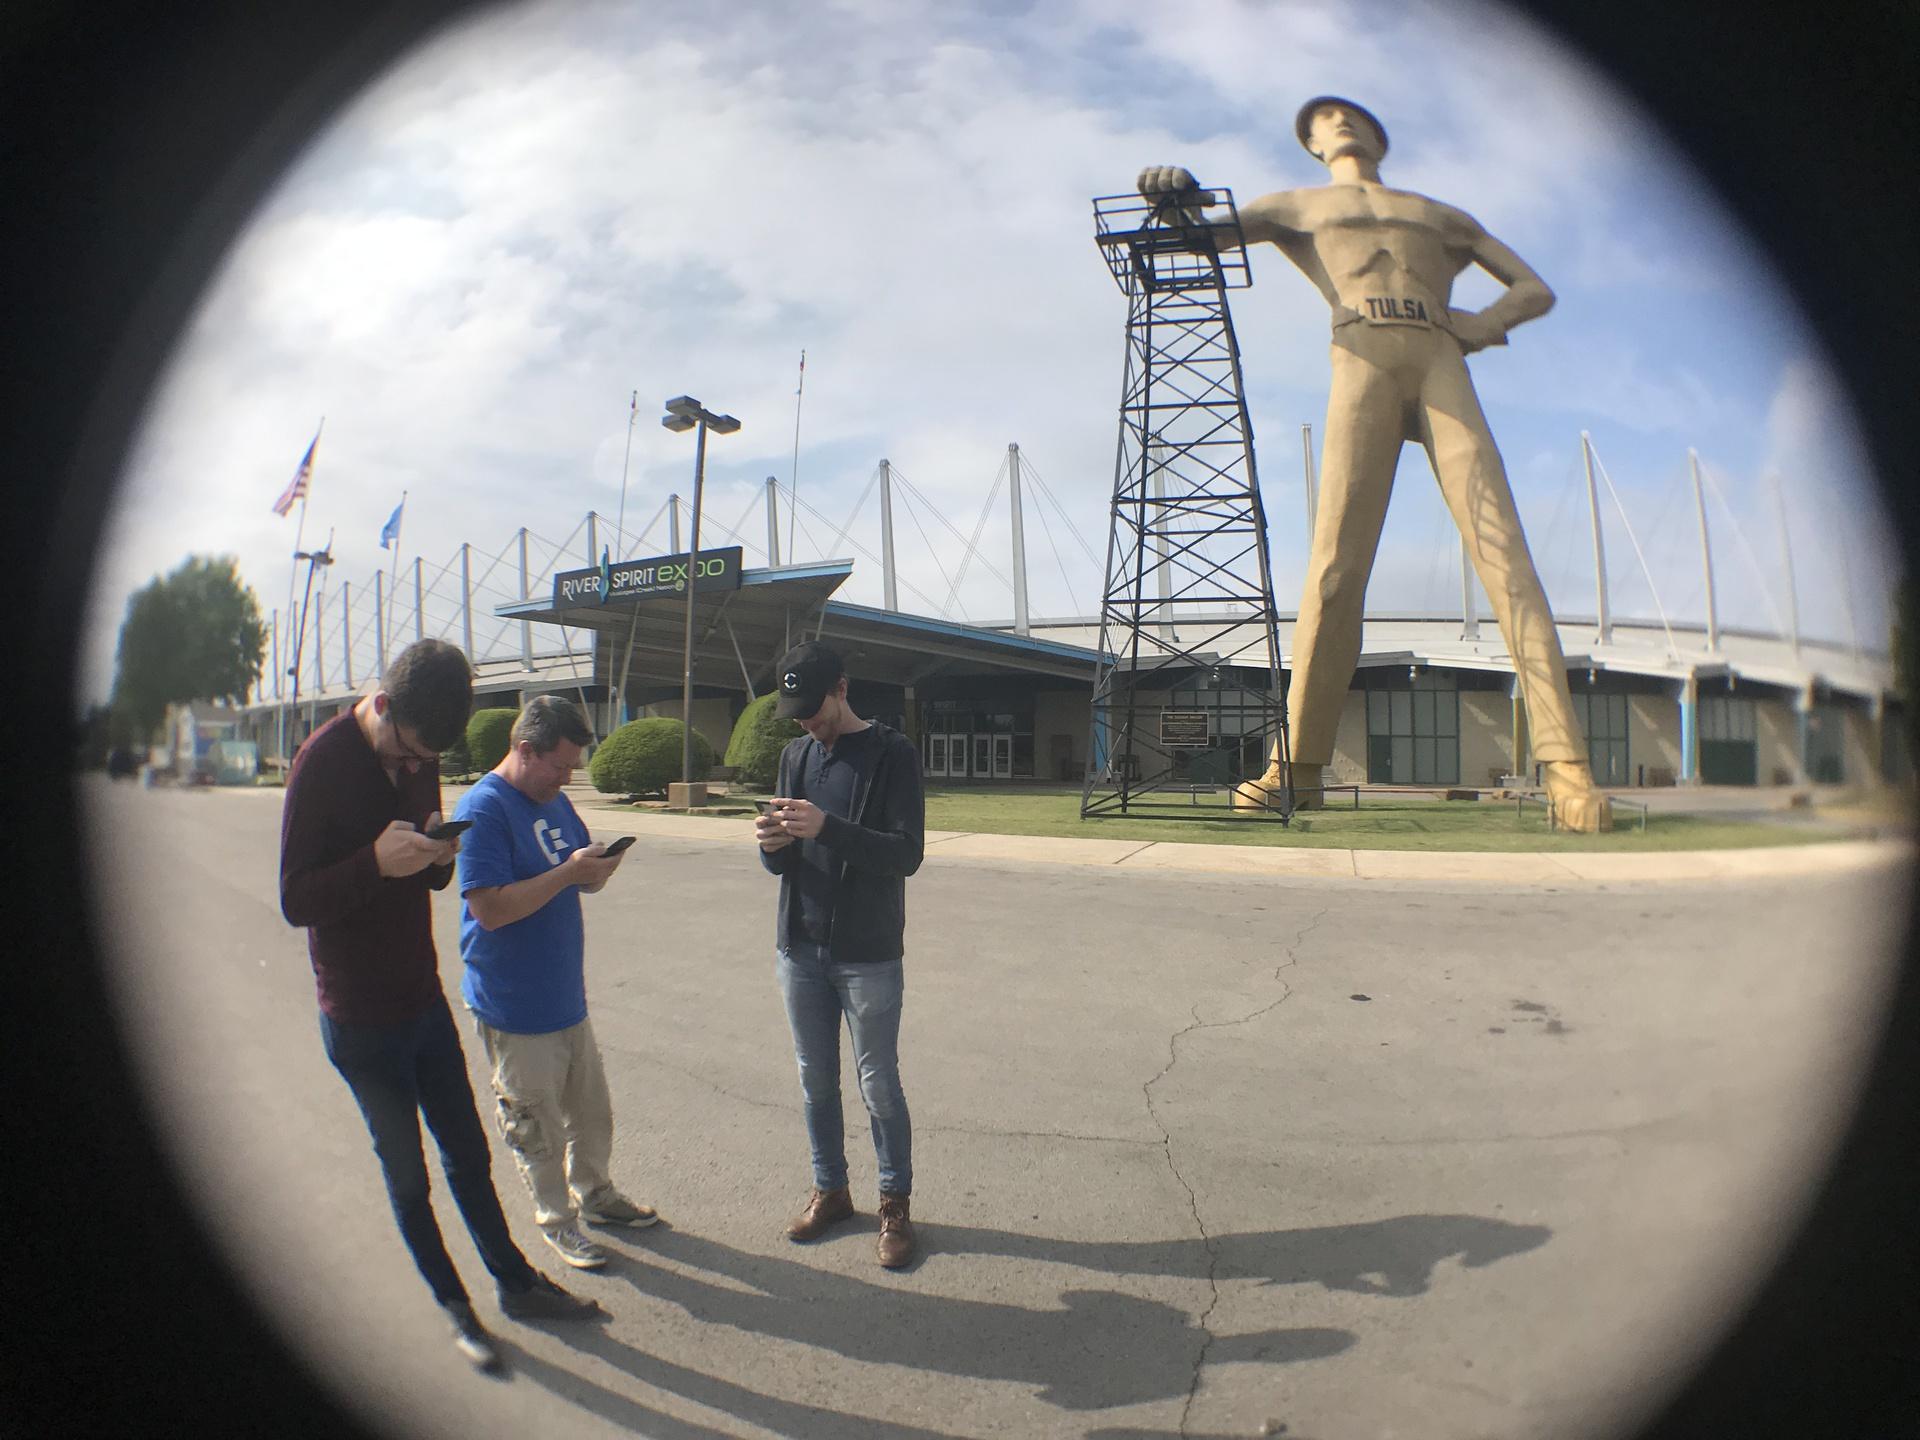 Lucia_Lucas_Don_Giovanni_Tulsa_Documentary_James_Kicklighter_4